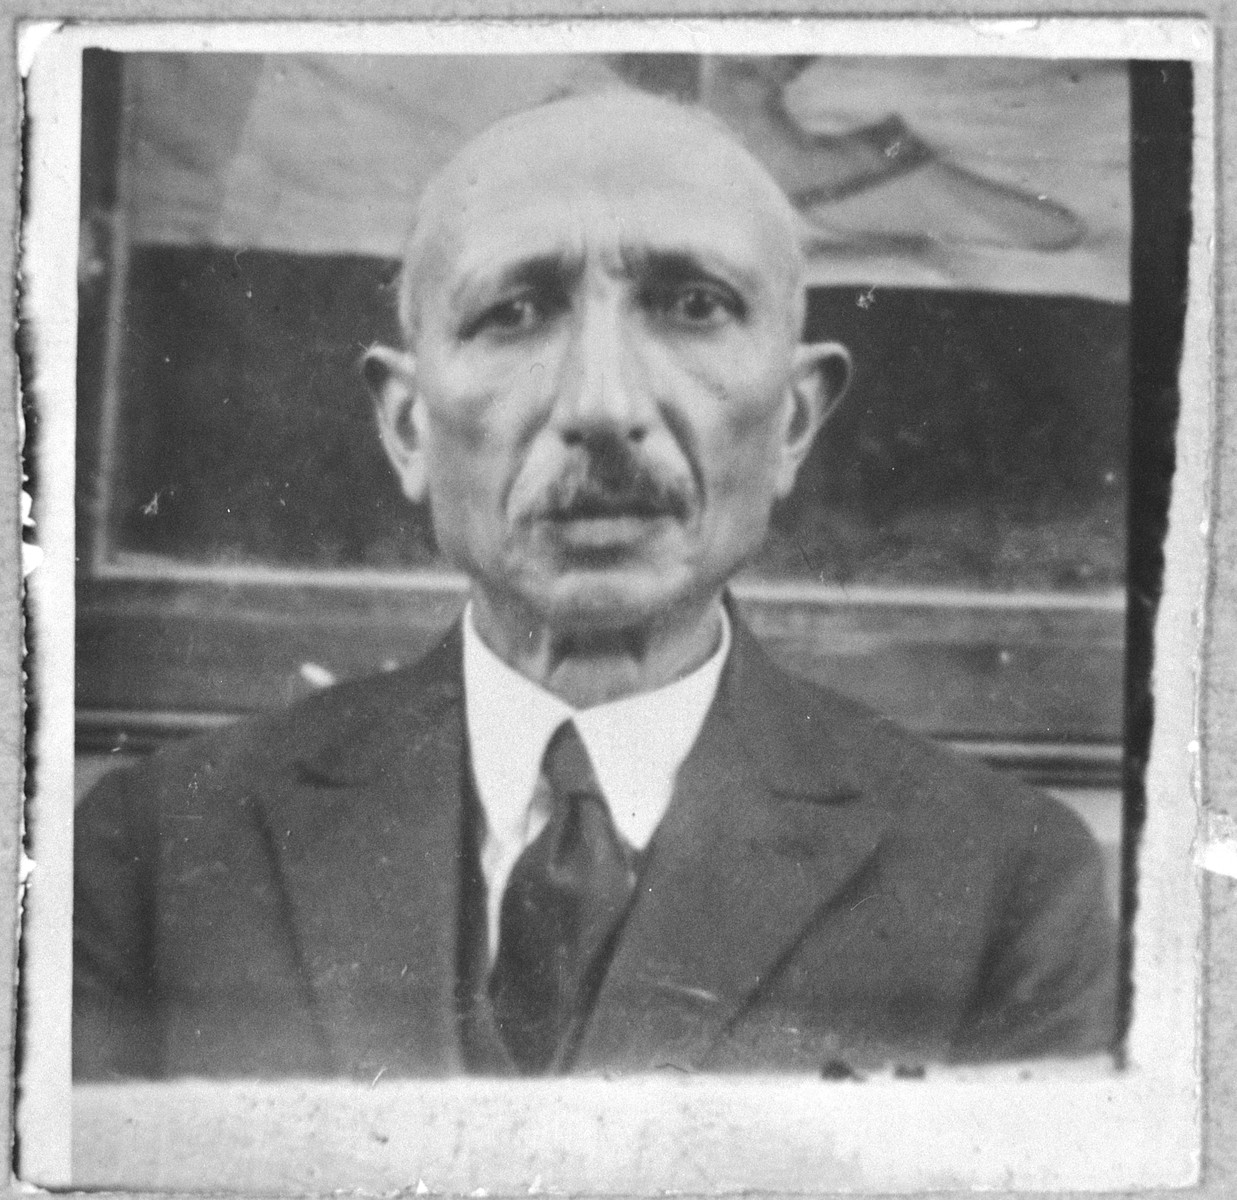 Portrait of Mushon Testa.  He was a clerk.  He lived at Ferisovatska 24a in Bitola.